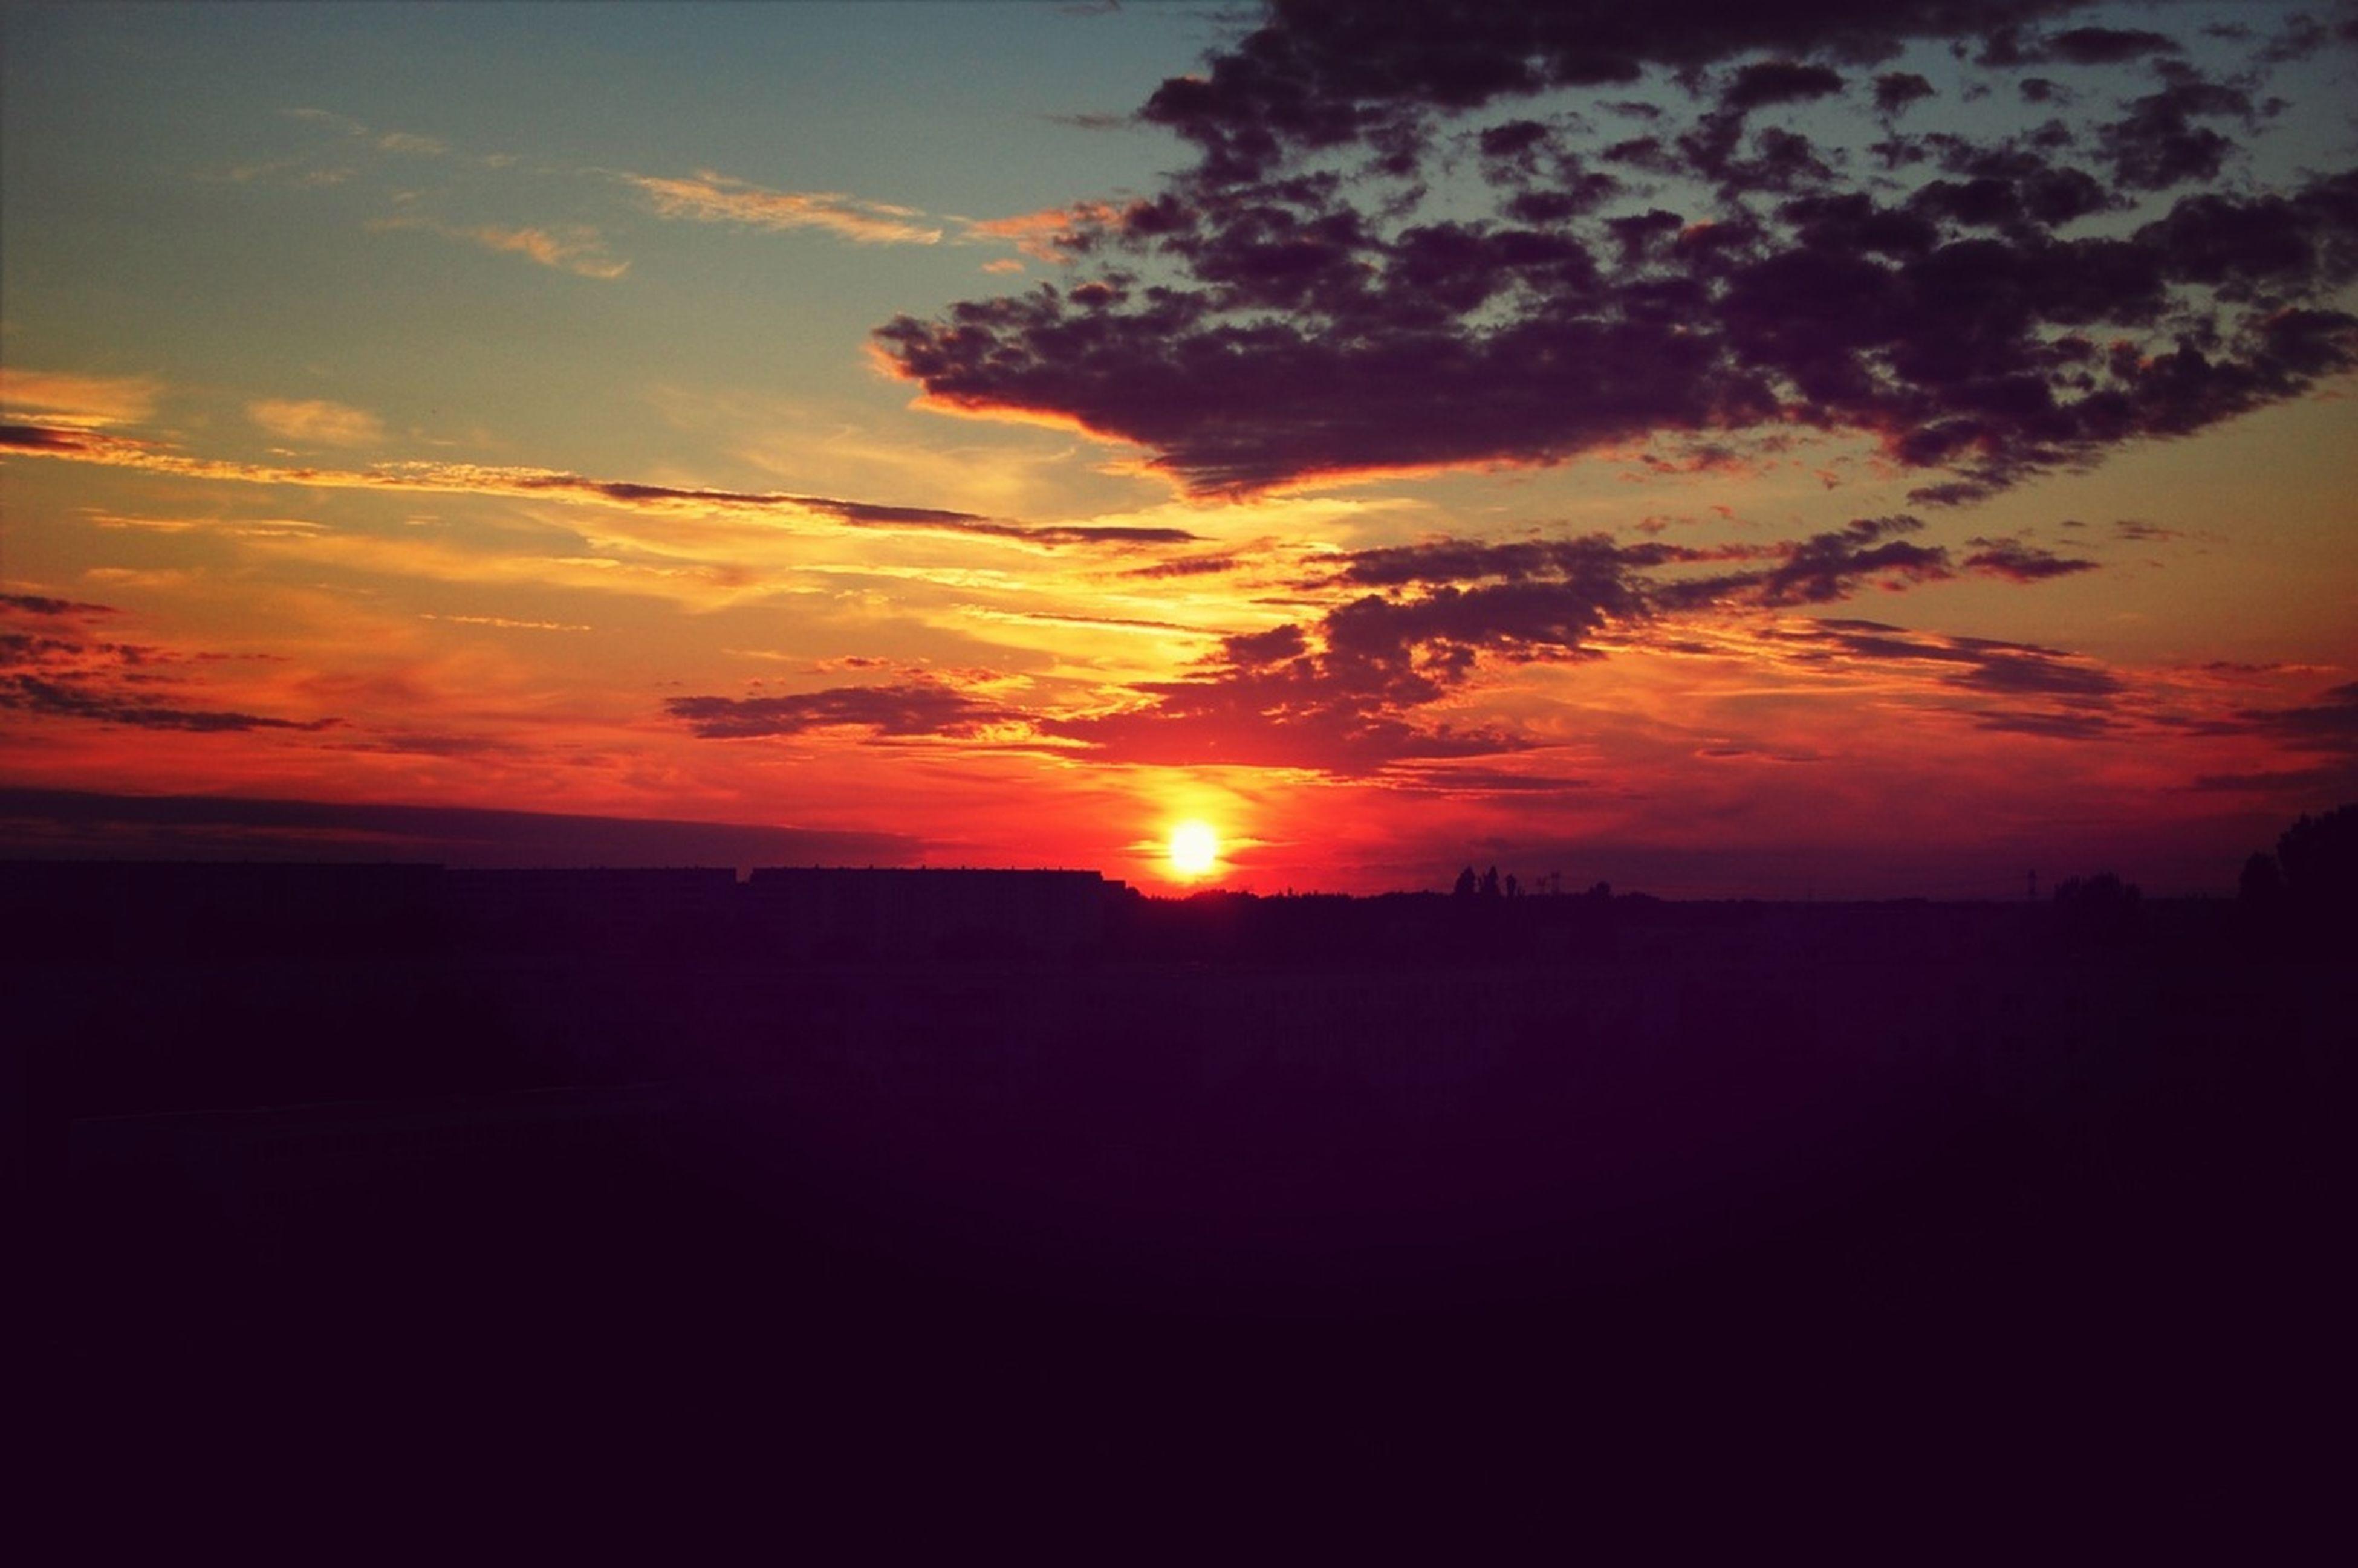 sunset, silhouette, orange color, sun, scenics, tranquil scene, sky, beauty in nature, tranquility, idyllic, nature, cloud - sky, landscape, dark, sunlight, dramatic sky, cloud, outline, moody sky, outdoors